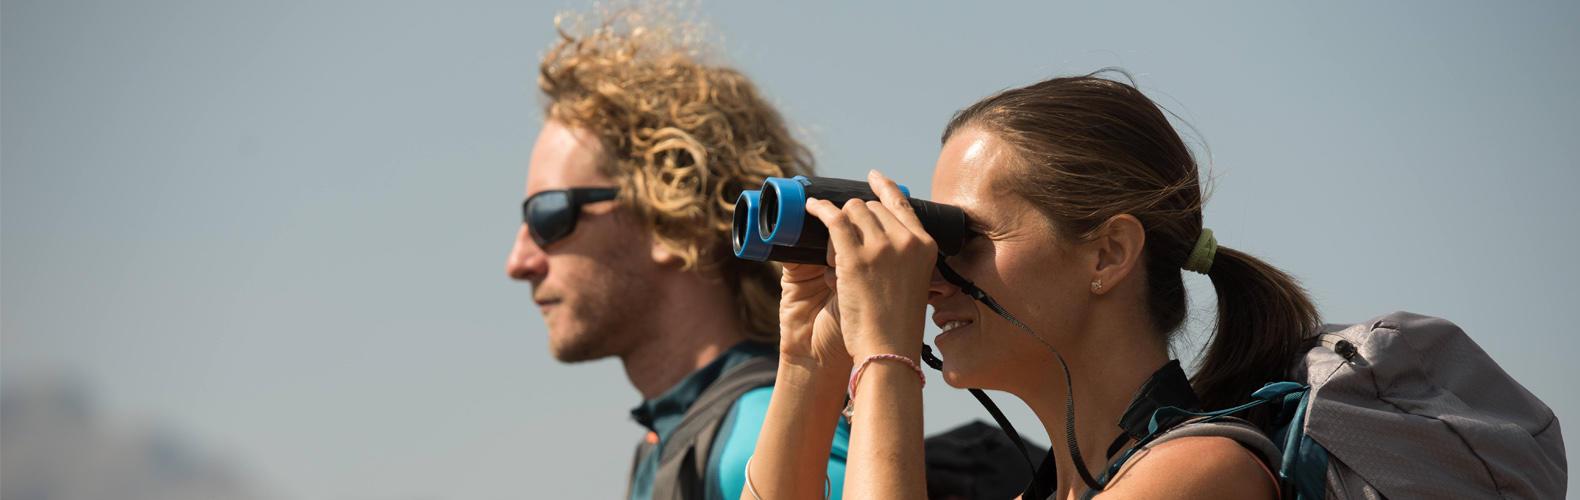 How to Choose Binoculars?